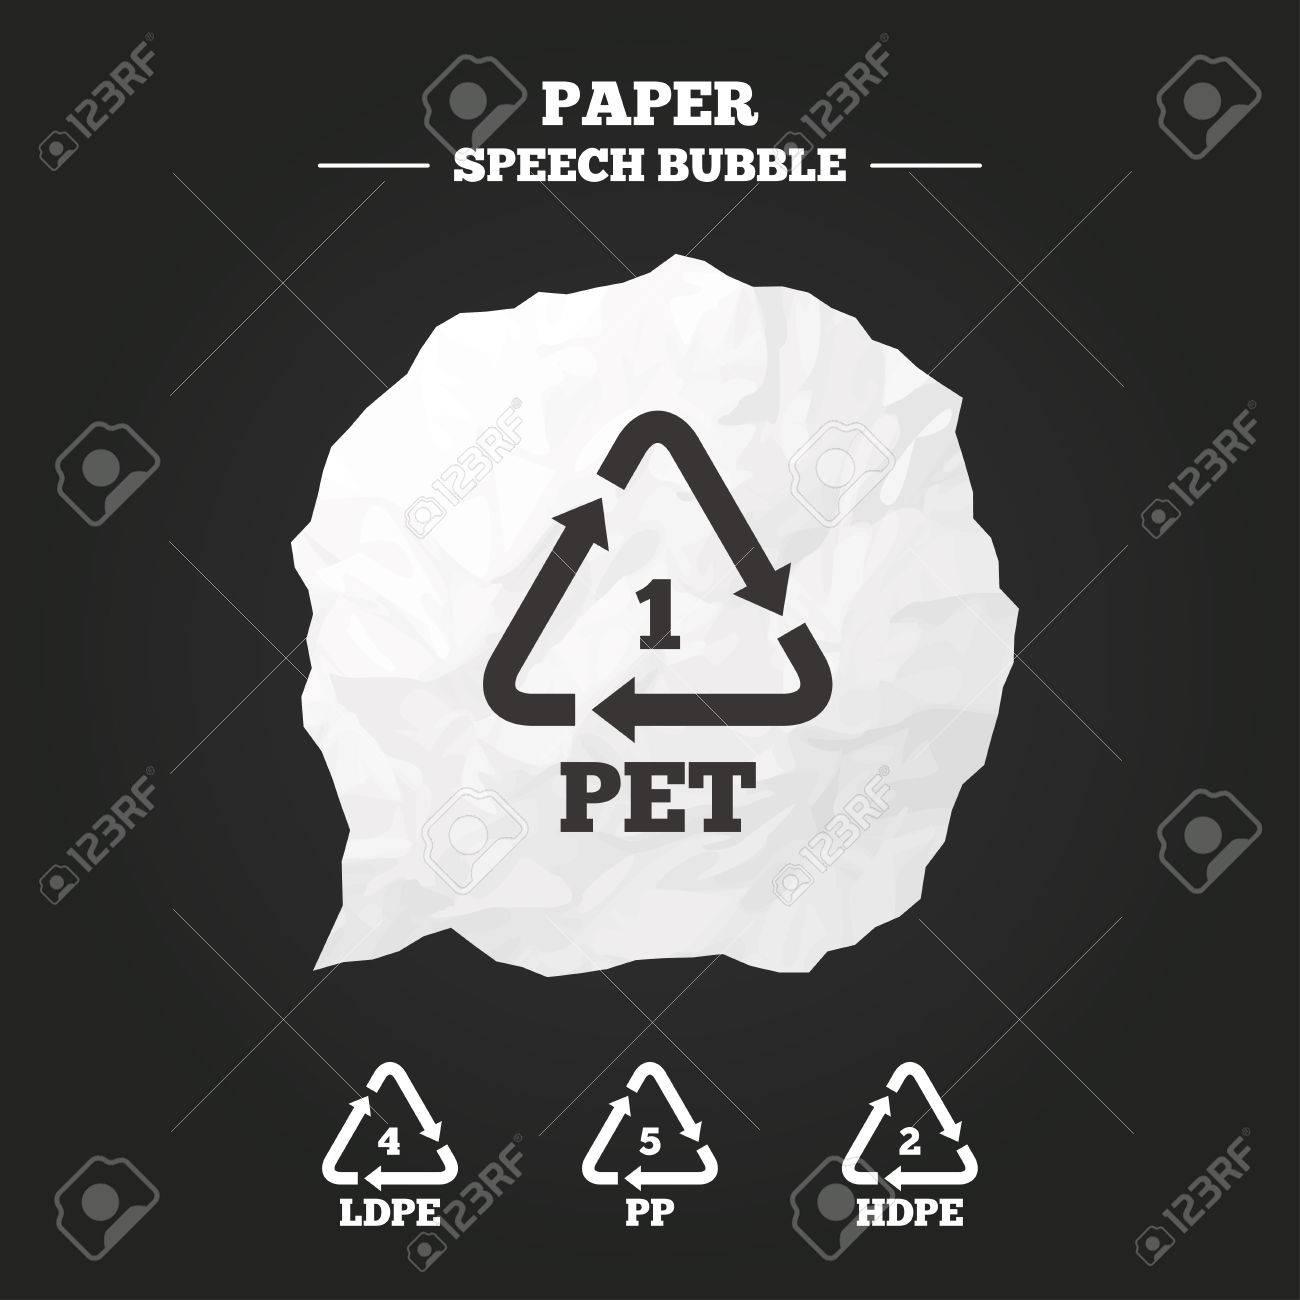 Pet 1 ld pe 4 pp 5 and hd pe 2 icons high density polyethylene pet 1 ld pe 4 pp 5 and hd pe 2 icons biocorpaavc Choice Image